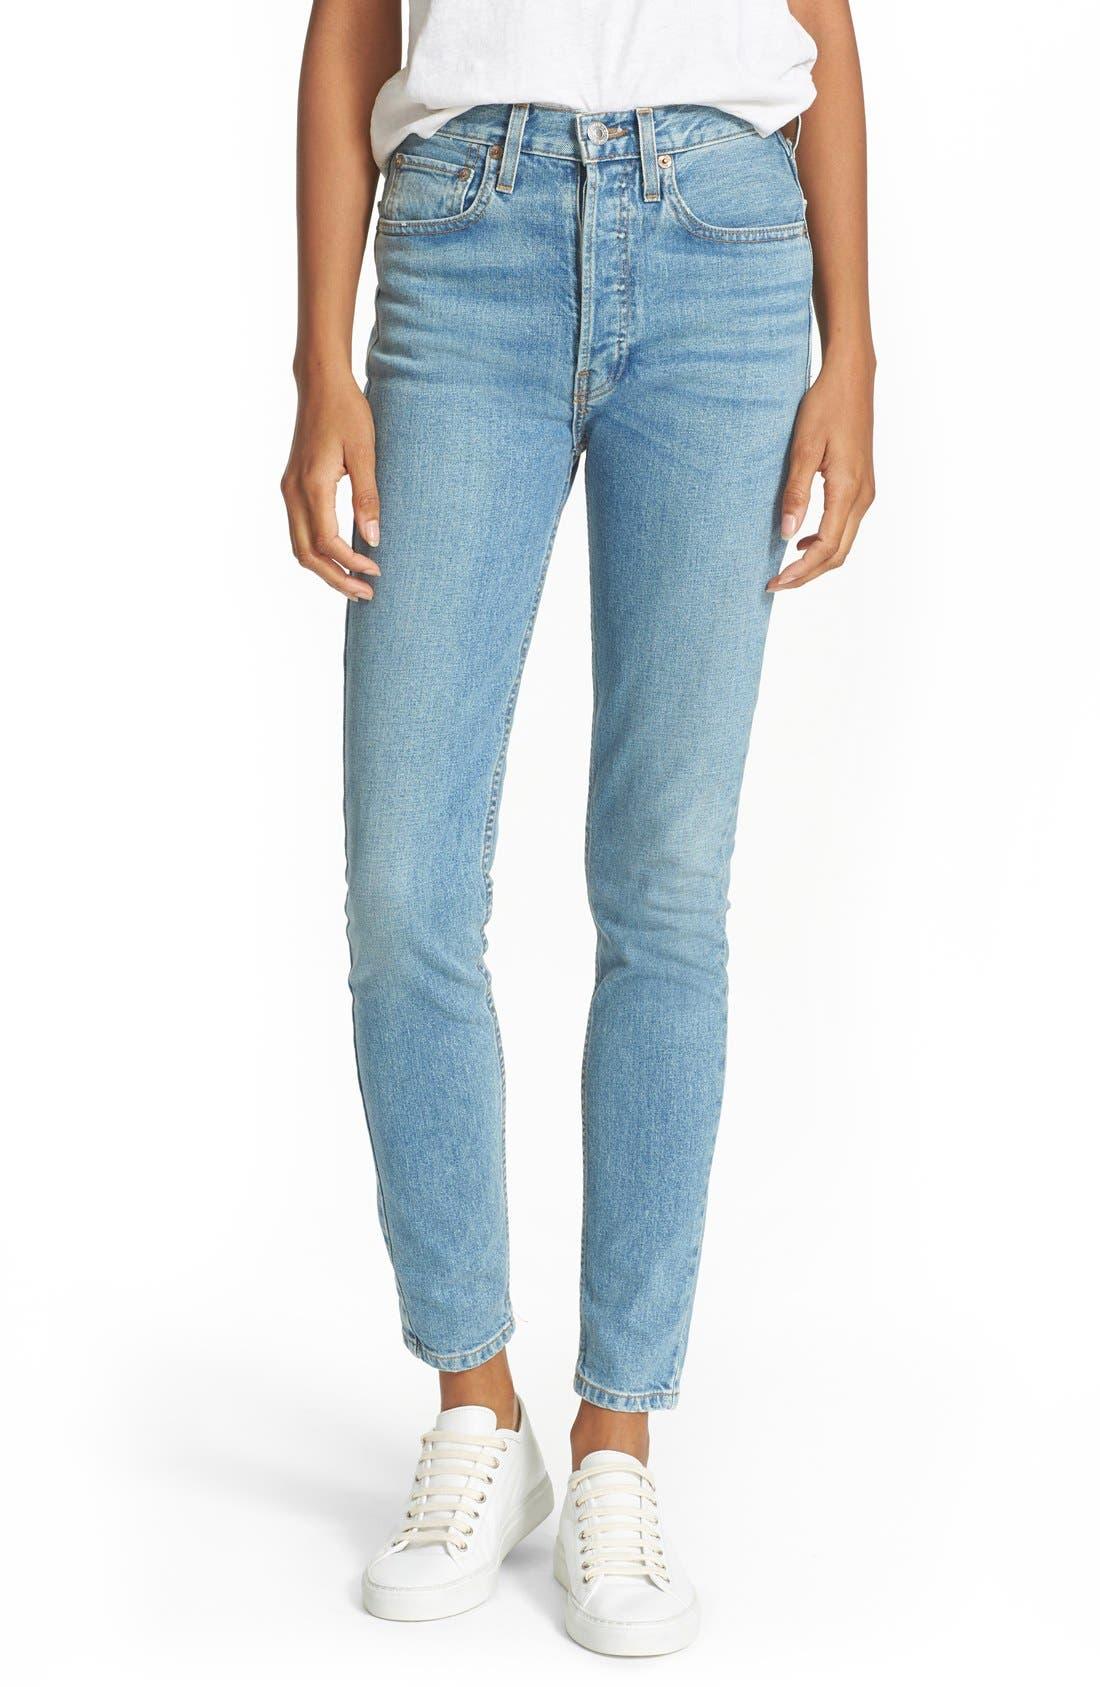 Originals High Rise Stretch Jeans,                         Main,                         color, 400